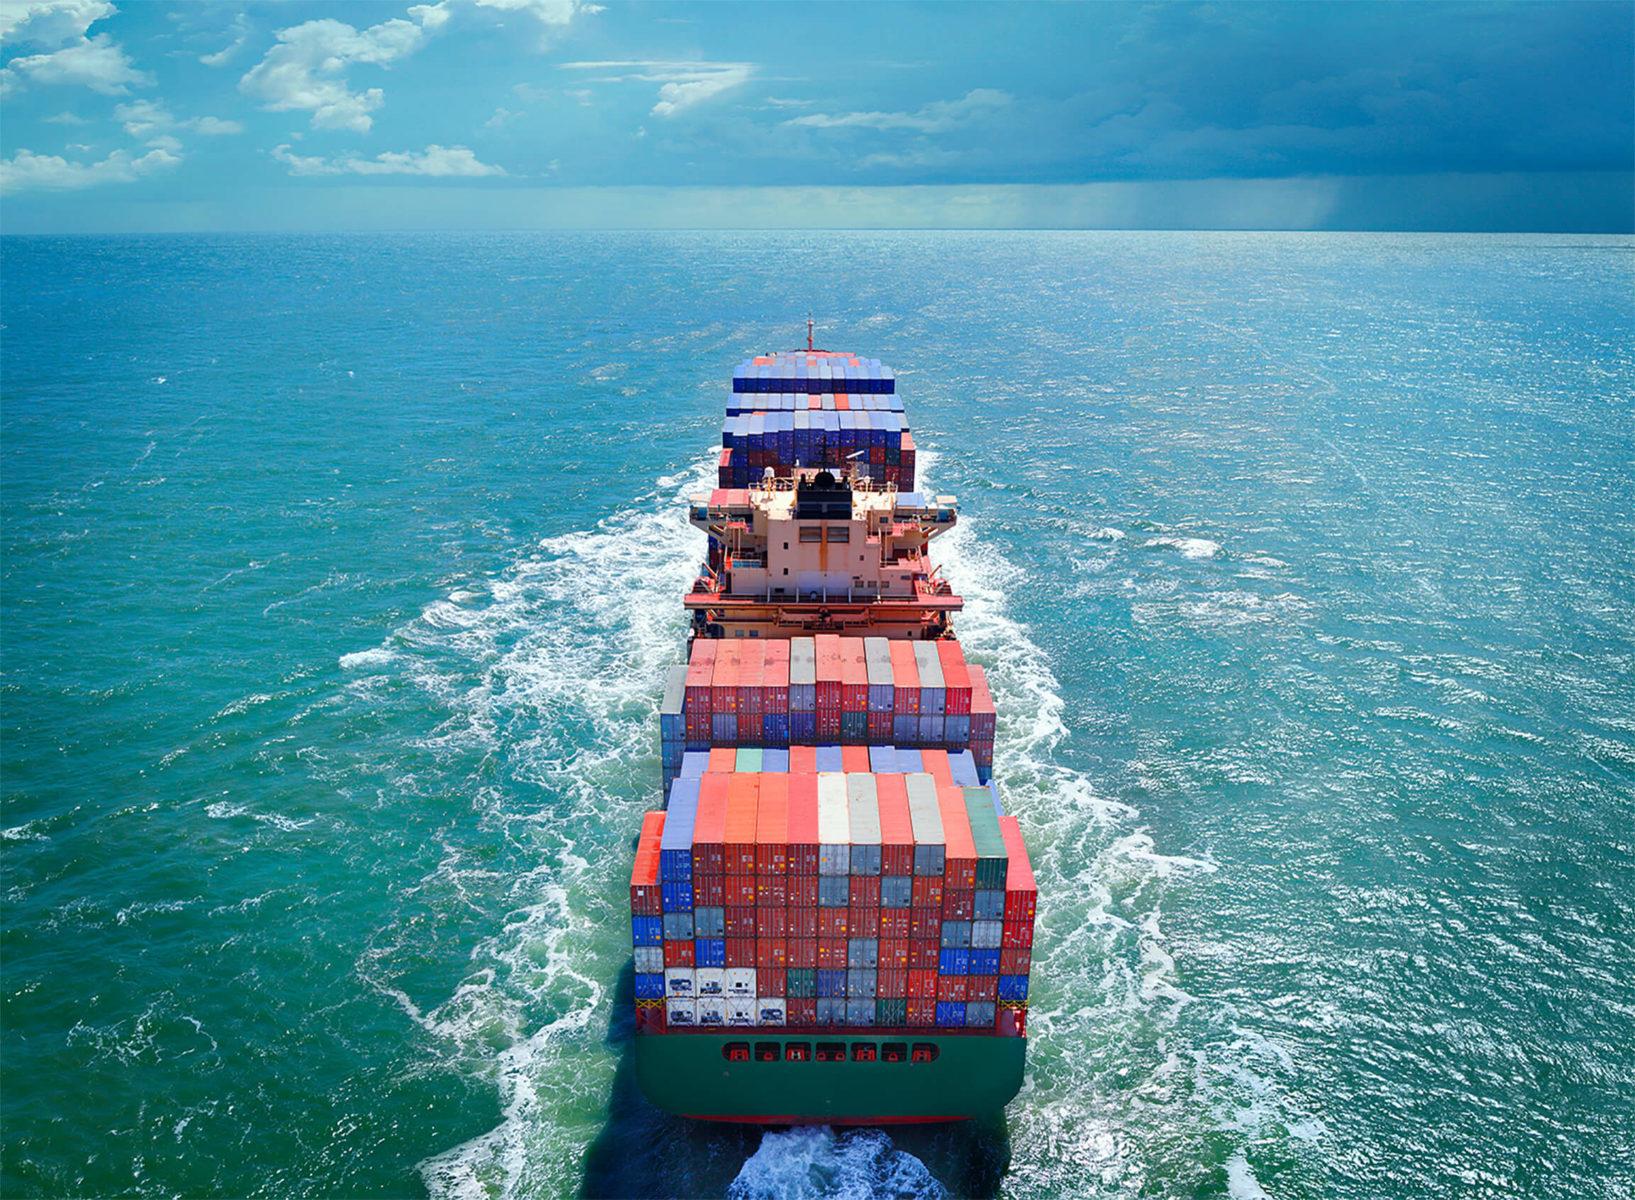 Global Customs Brokers  Sap Erp  Supply Chain Logistics Customs Brokers